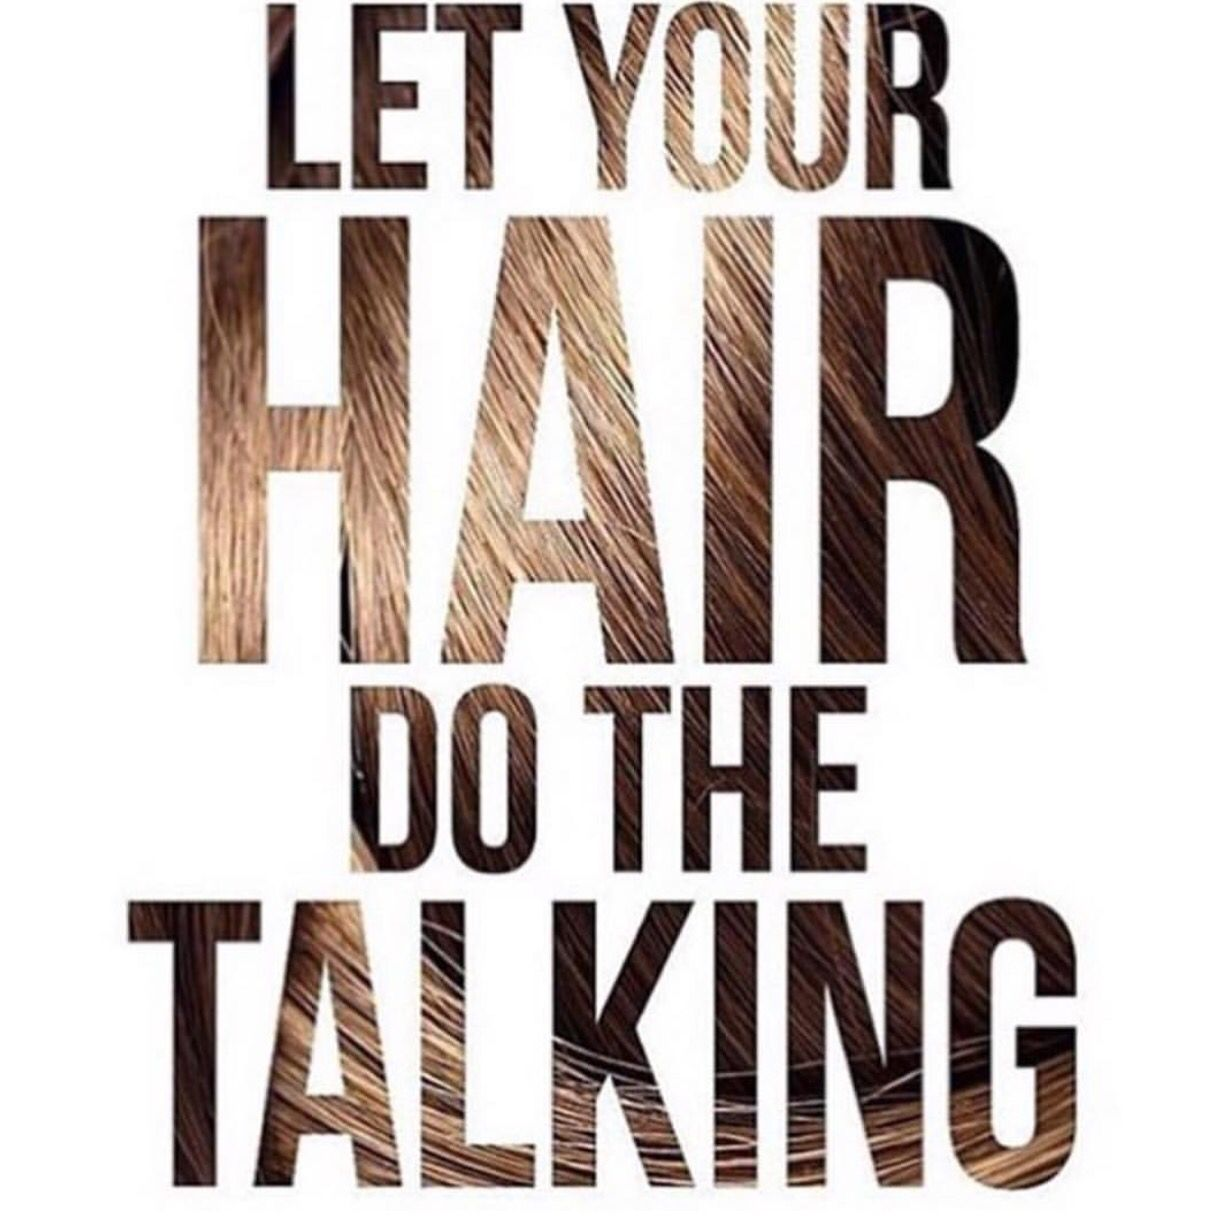 Hair Salon Mobile App How Will It Help Me Haircut Pinterest